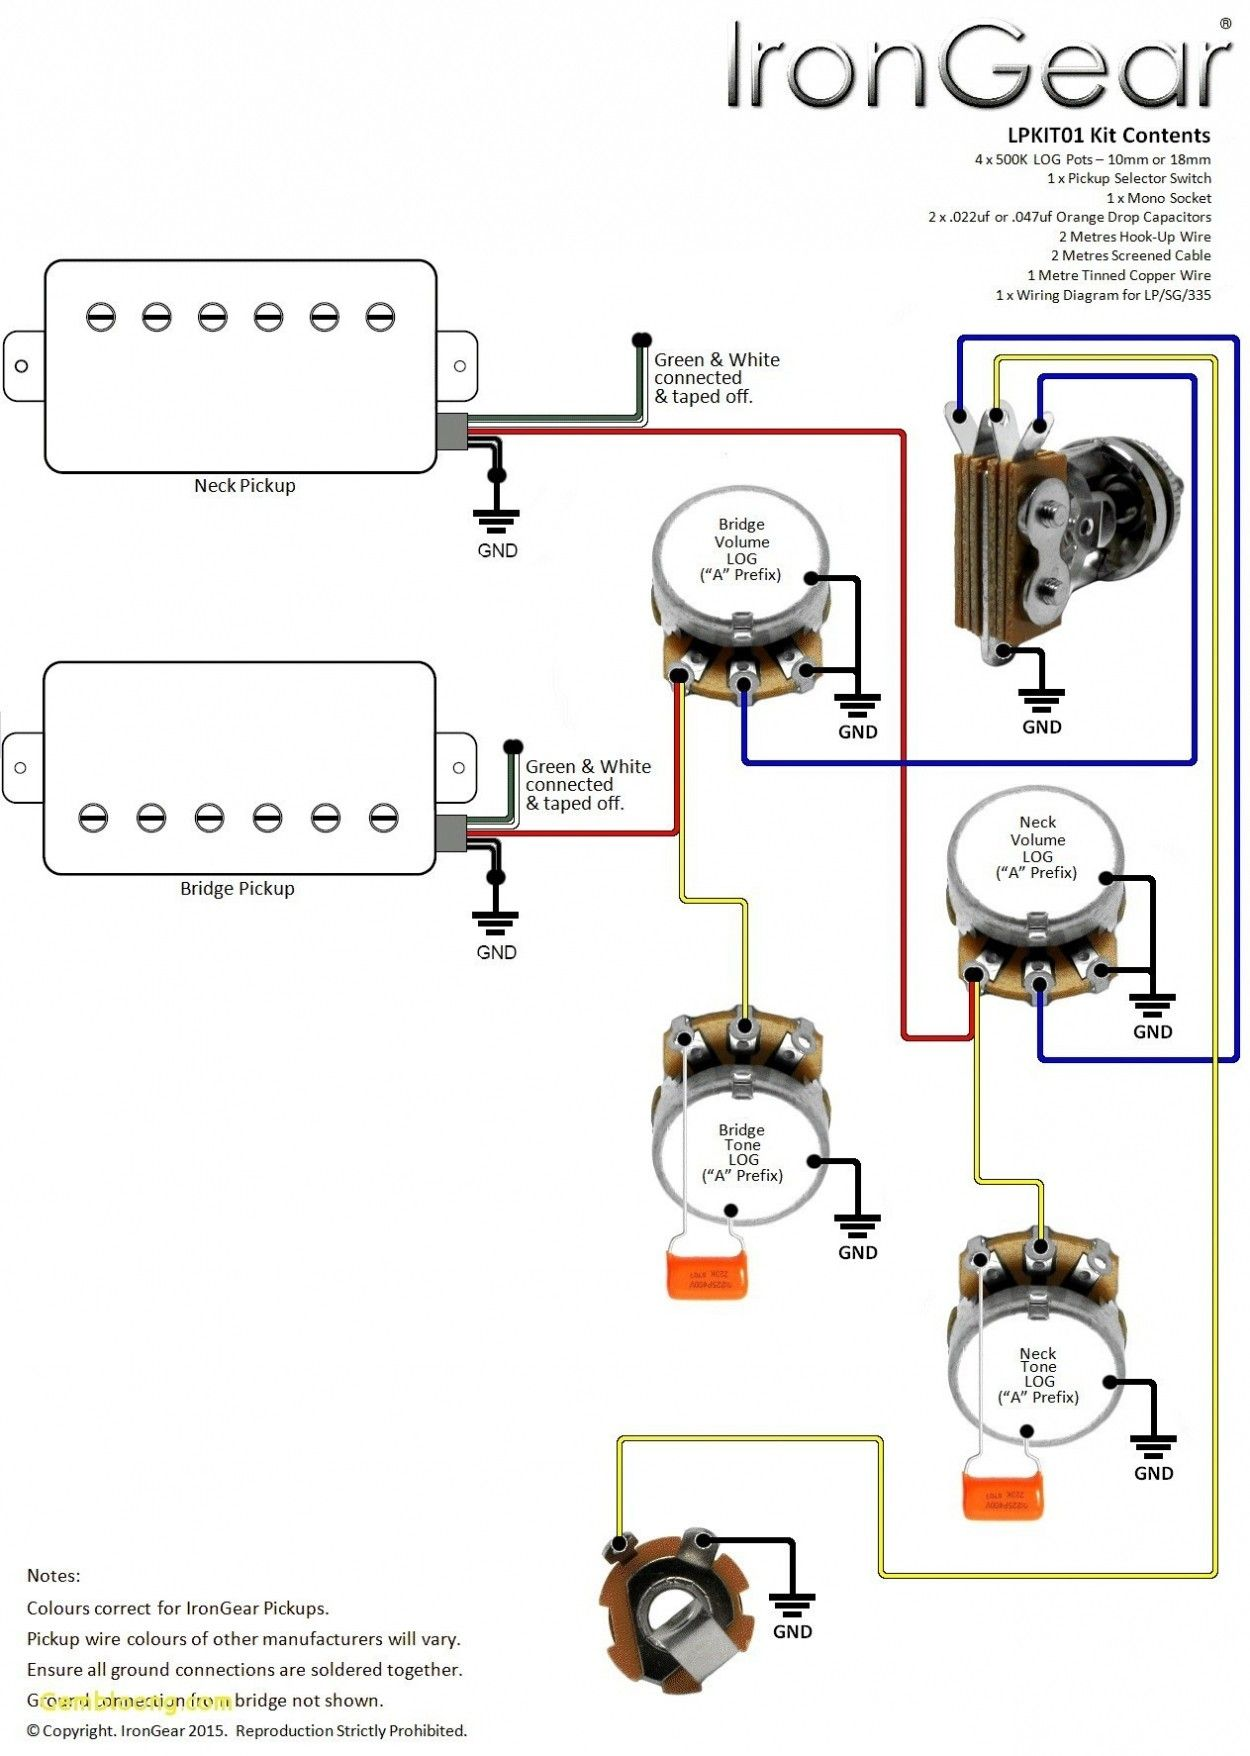 medium resolution of unique wiring diagram for epiphone les paul special diagram diagramsample diagramtemplate wiringdiagram diagramchart worksheet worksheettemplate